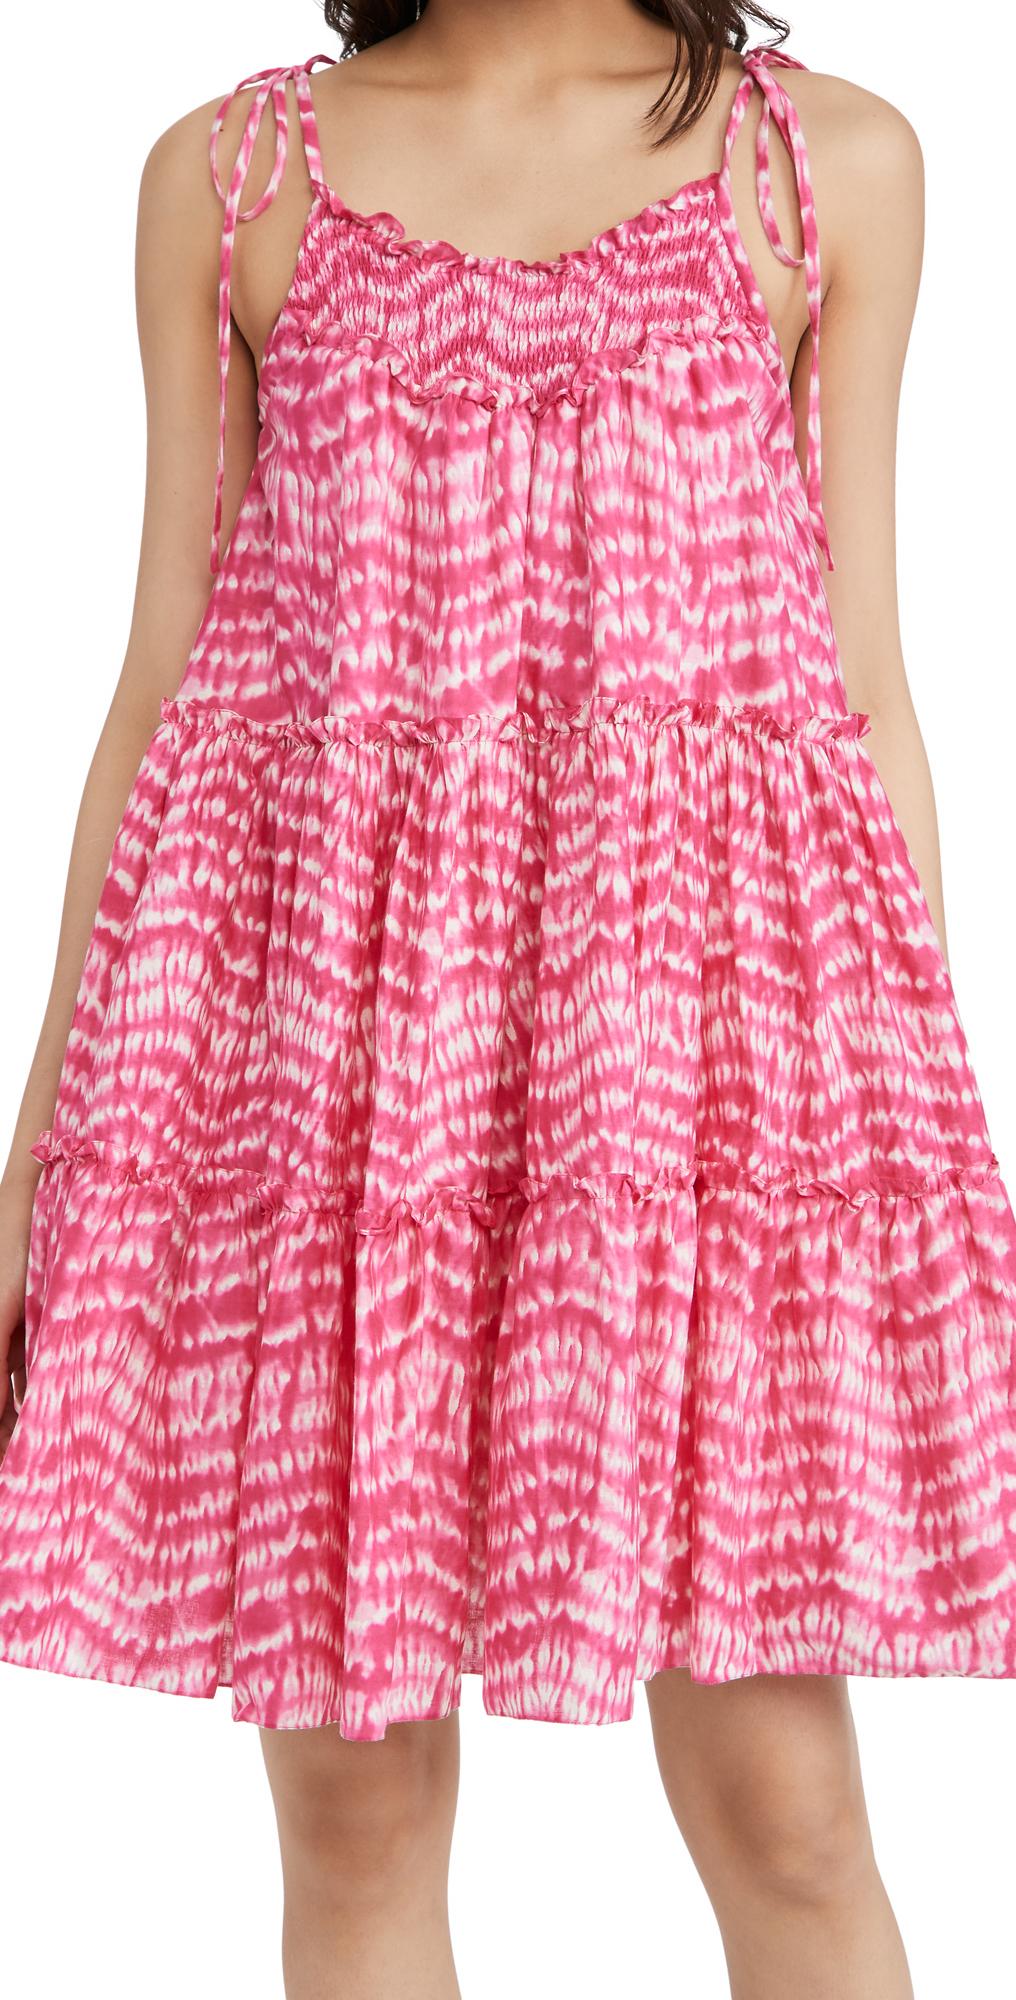 Charina Sarte Isa Dress